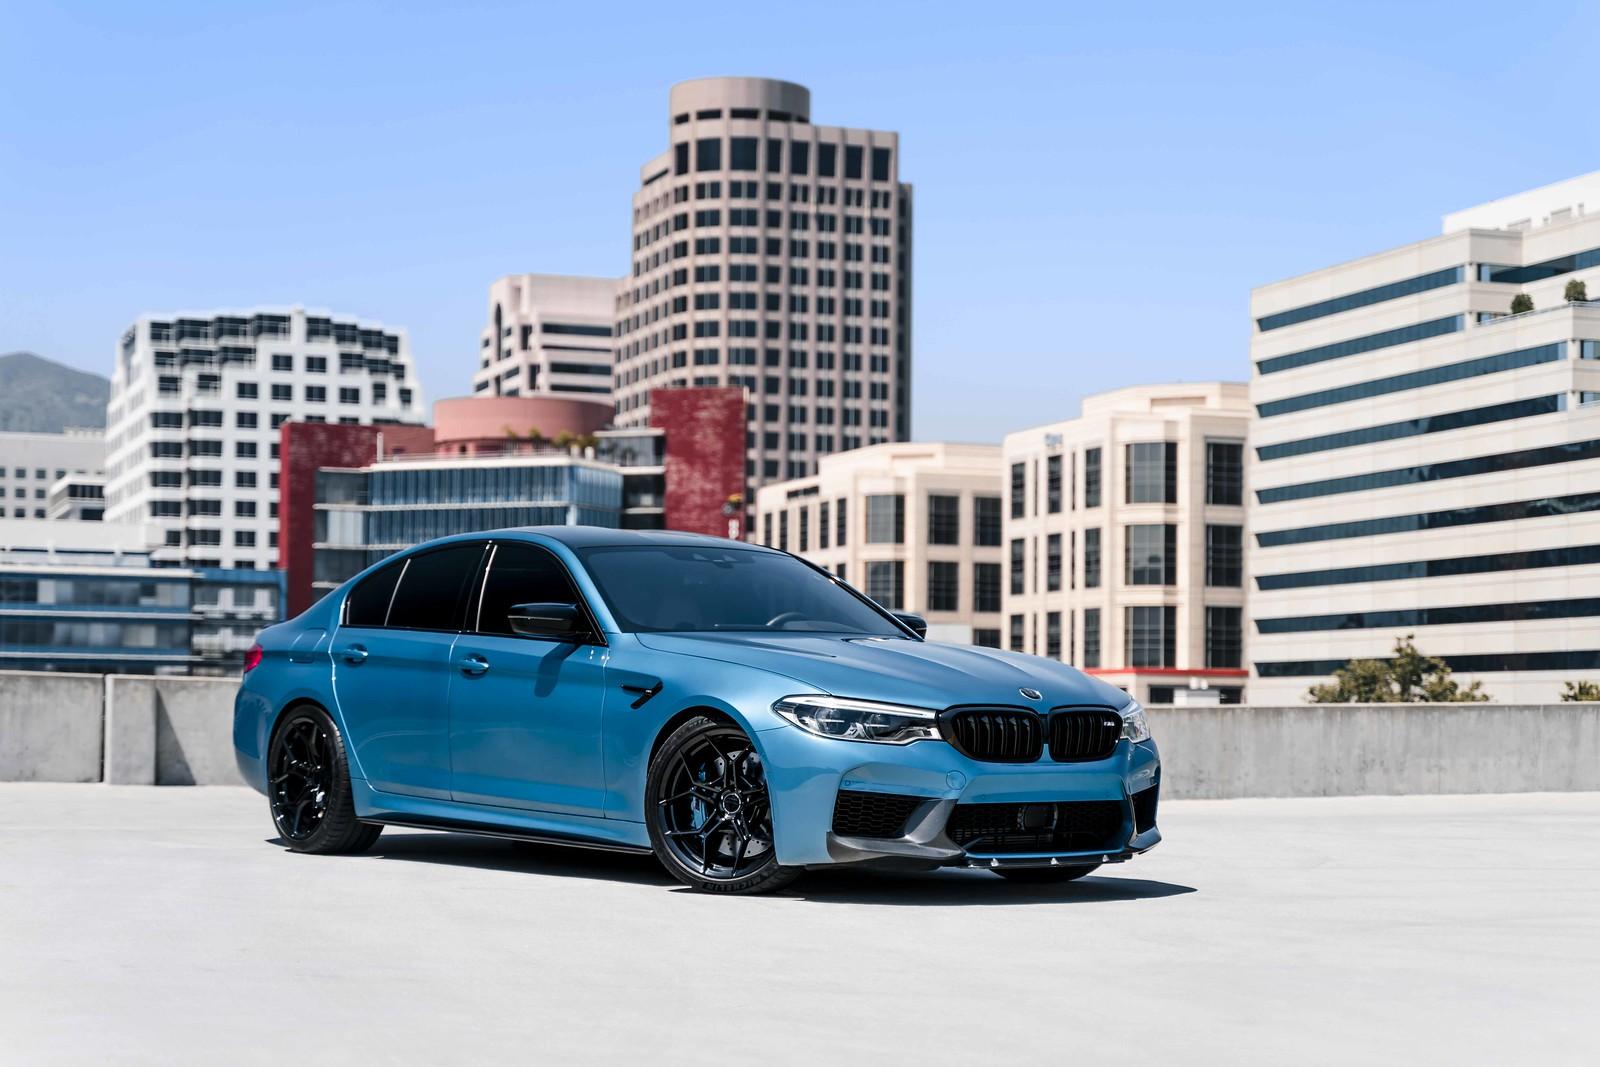 2020_BMW_M5_BDF25_Gloss_Black_Website_Version_6